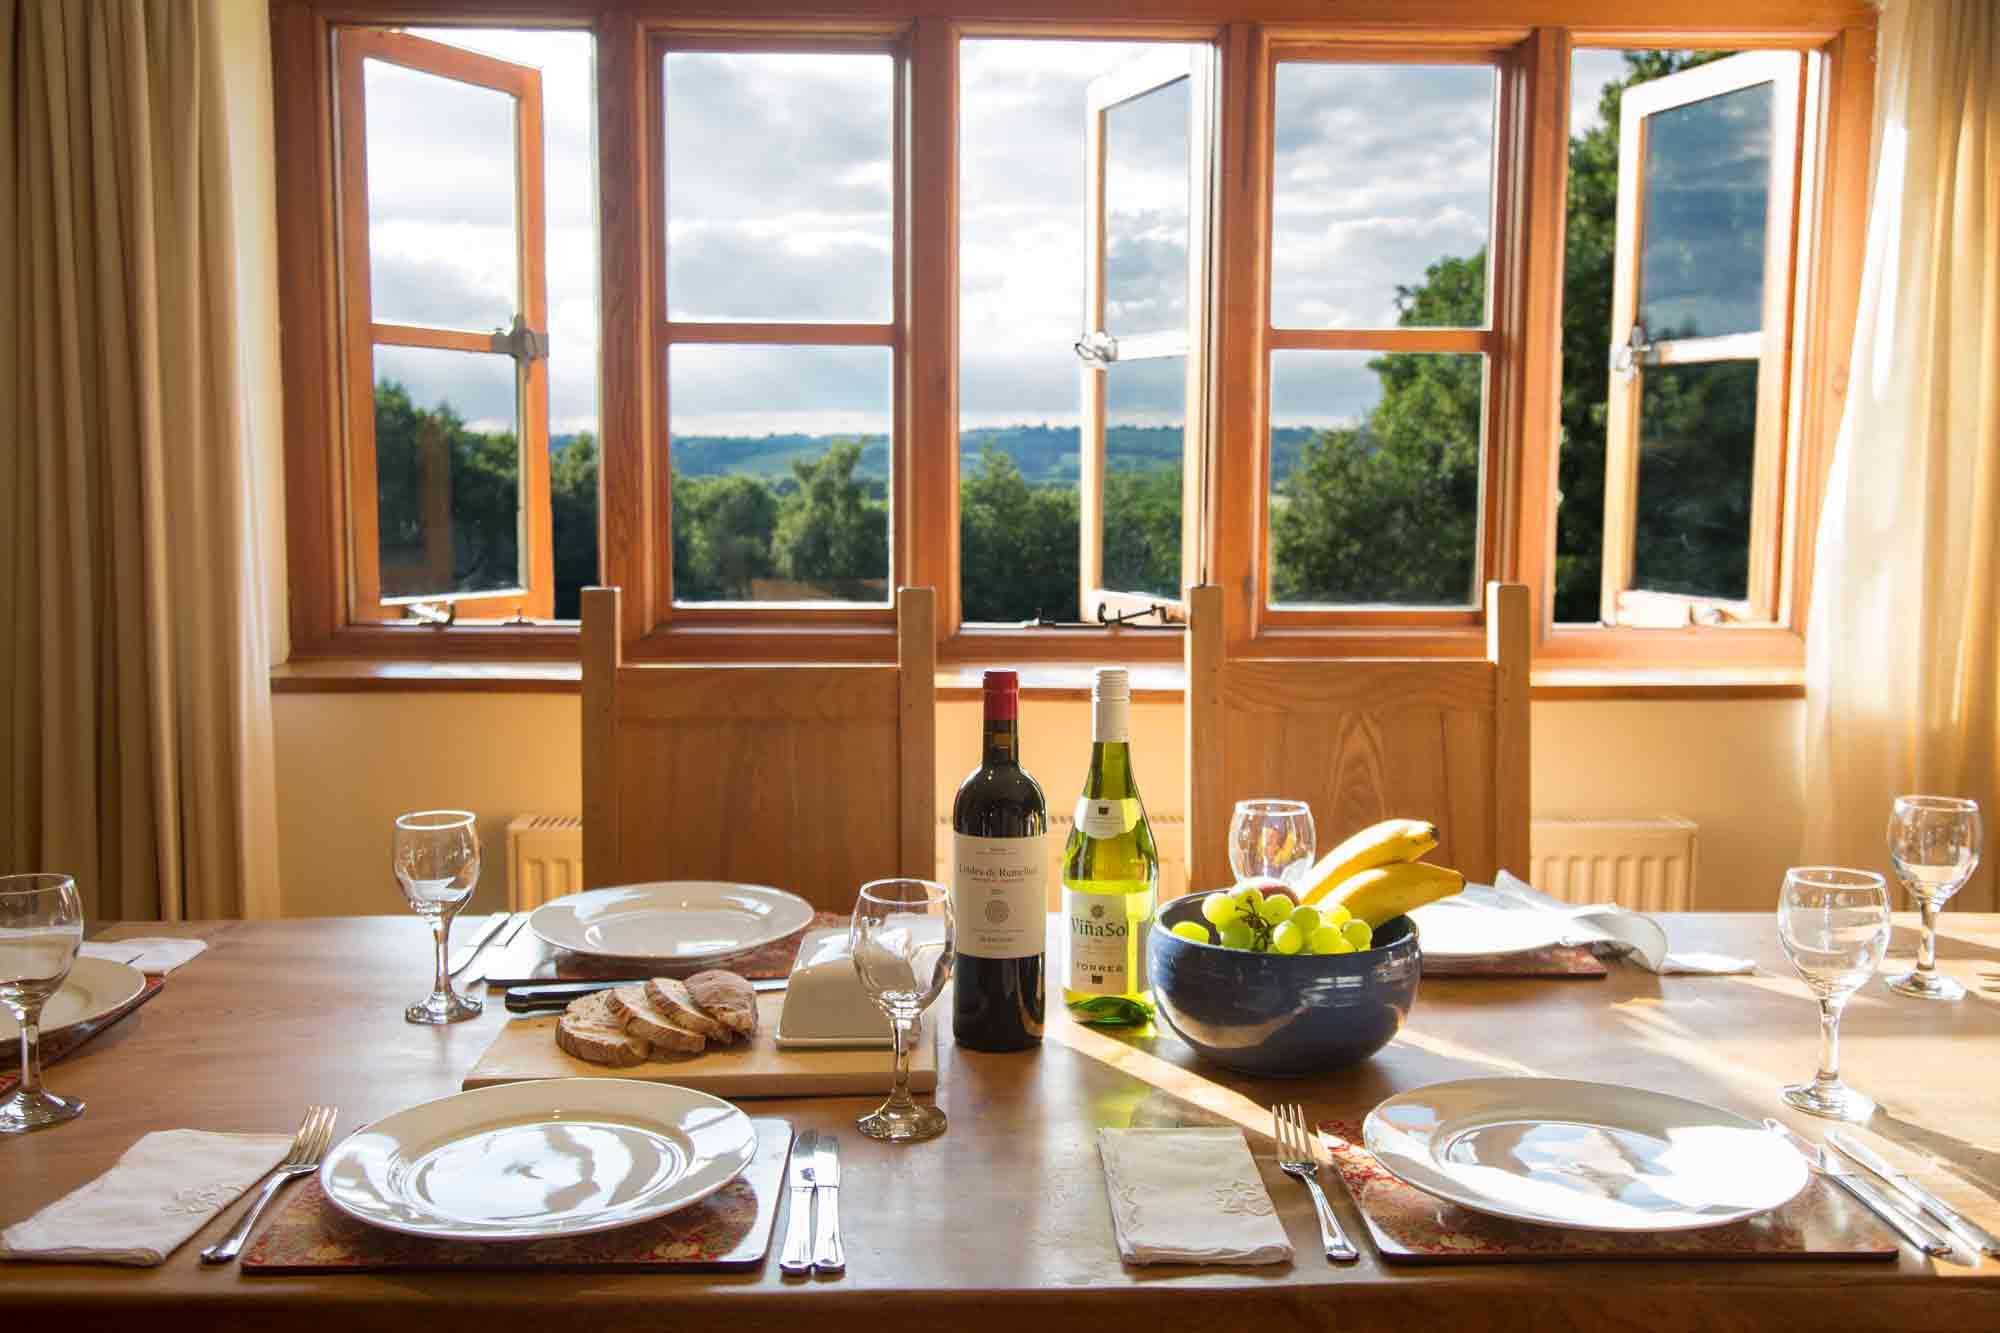 Cobnut - Heath Farm Cottages - Chipping Norton - Dining Table Views